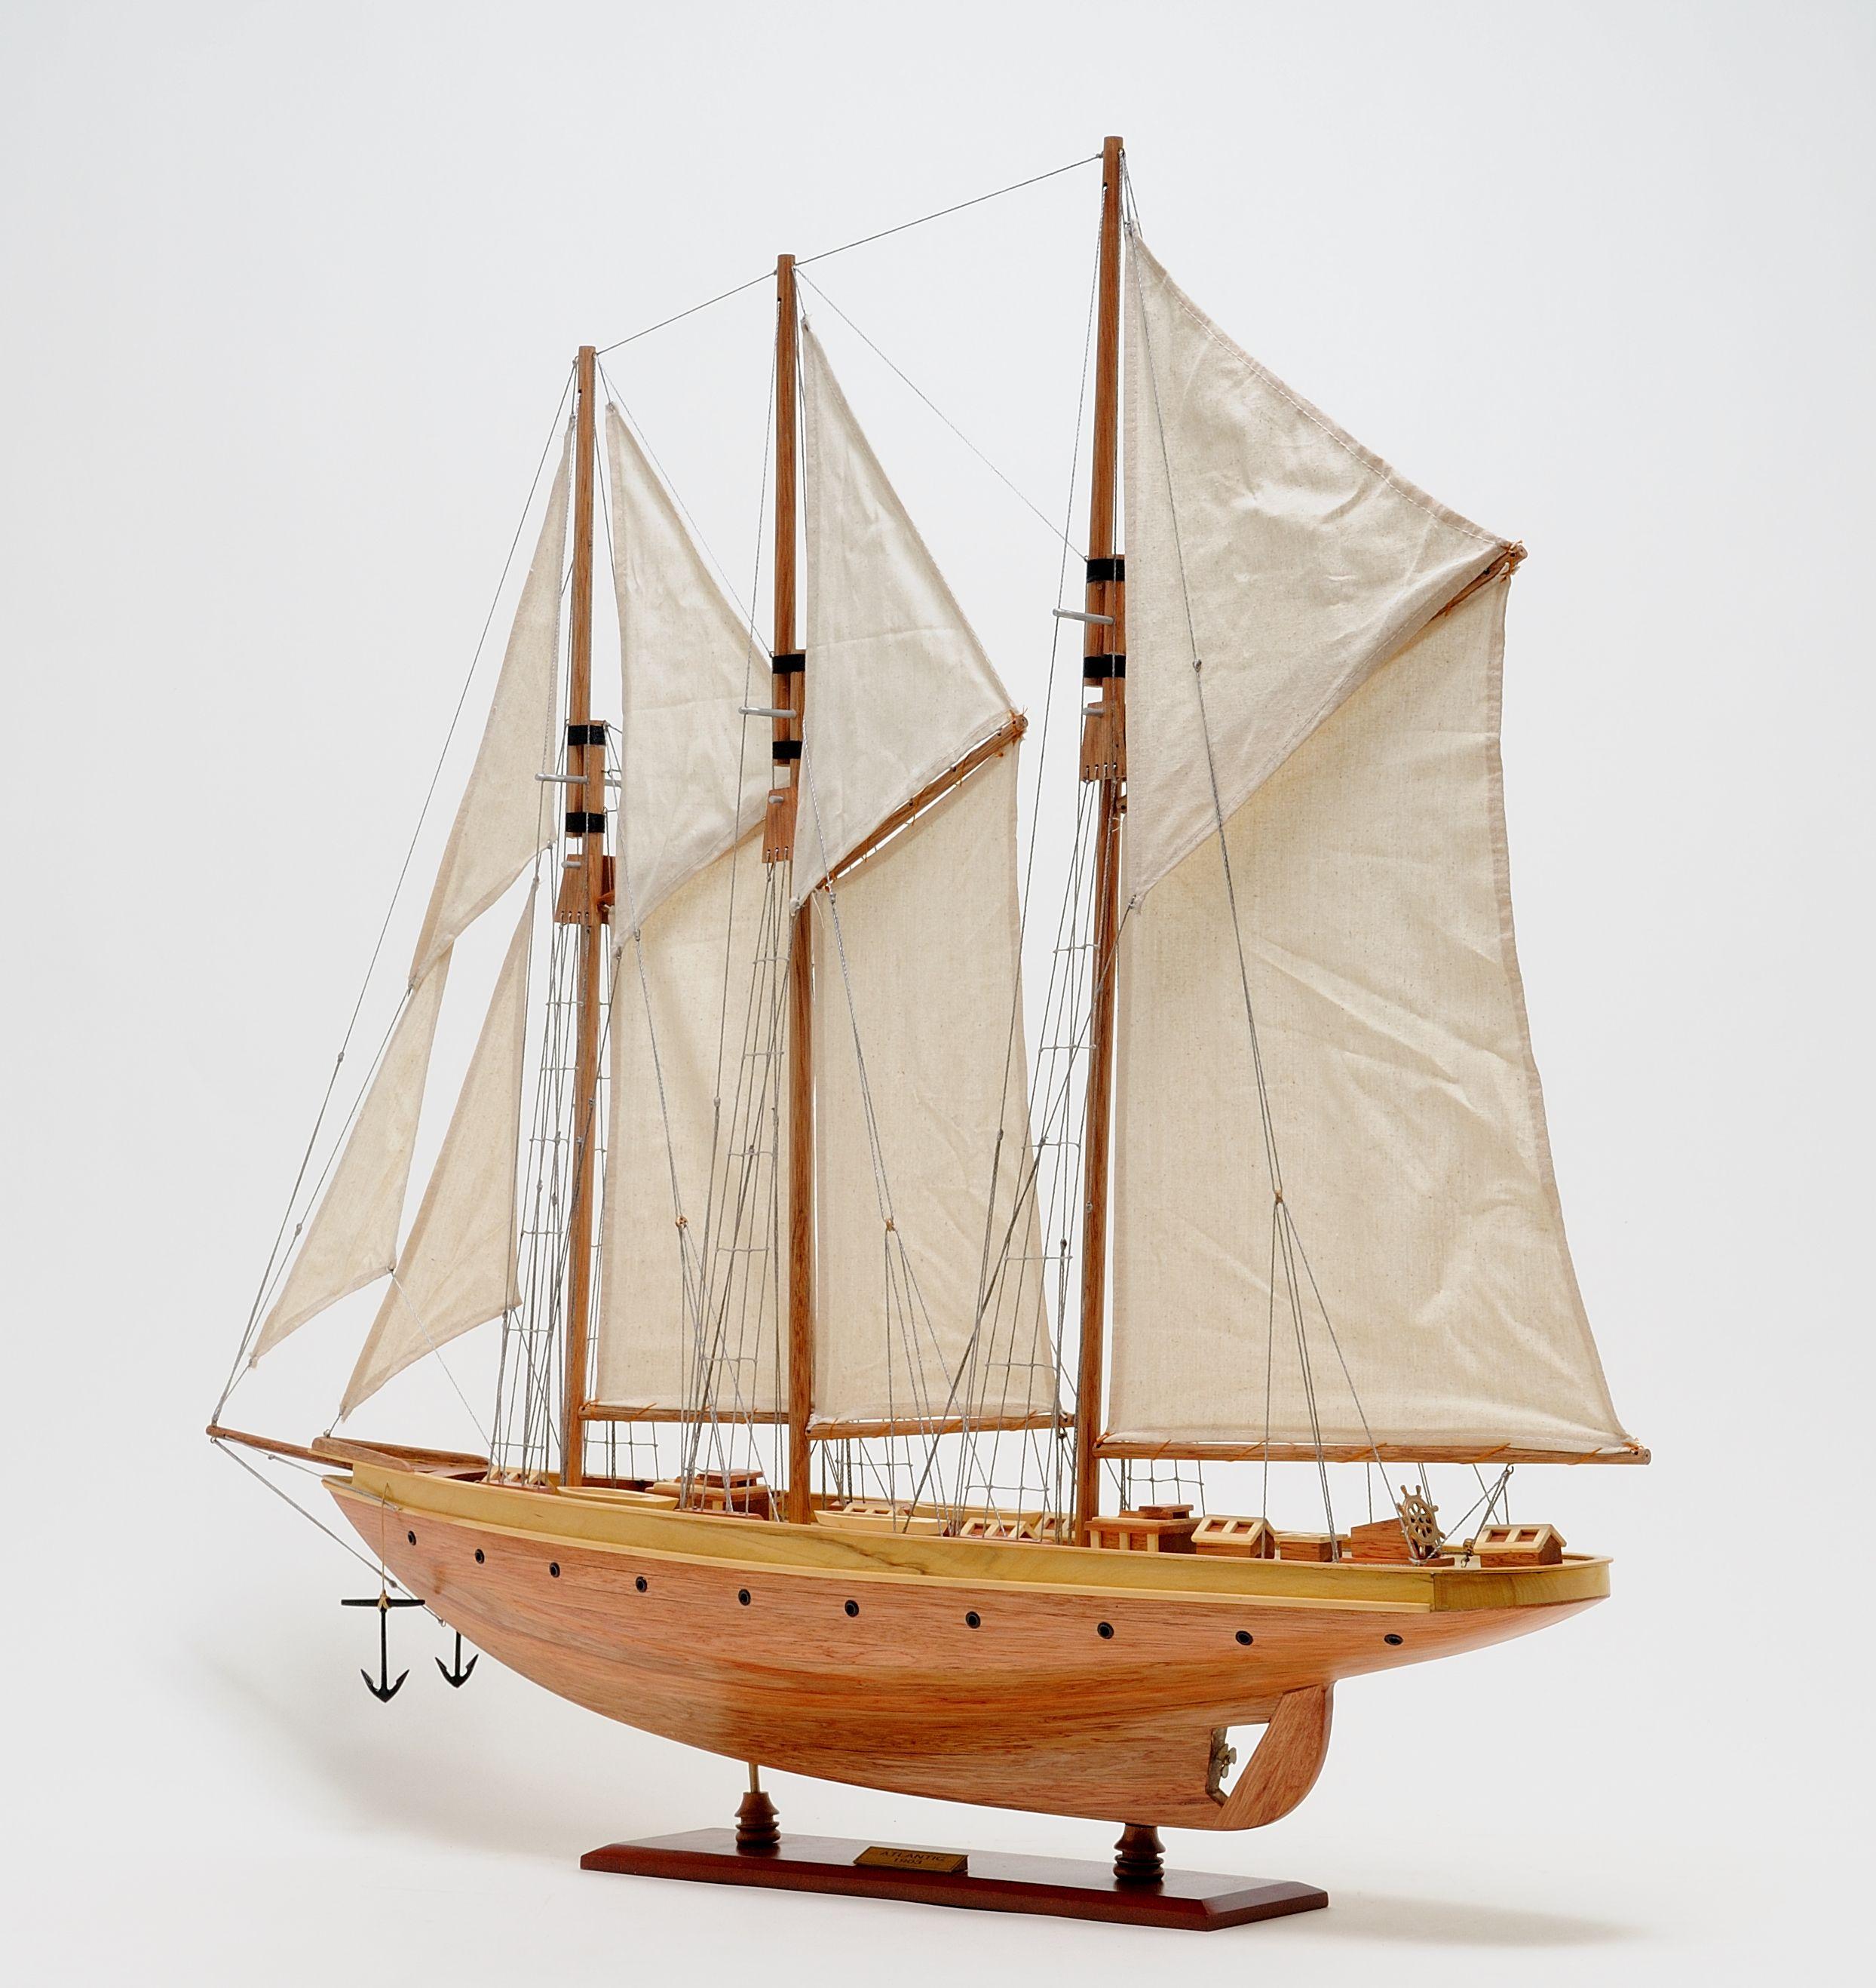 2278-13030-Atlantic-Model-Yacht